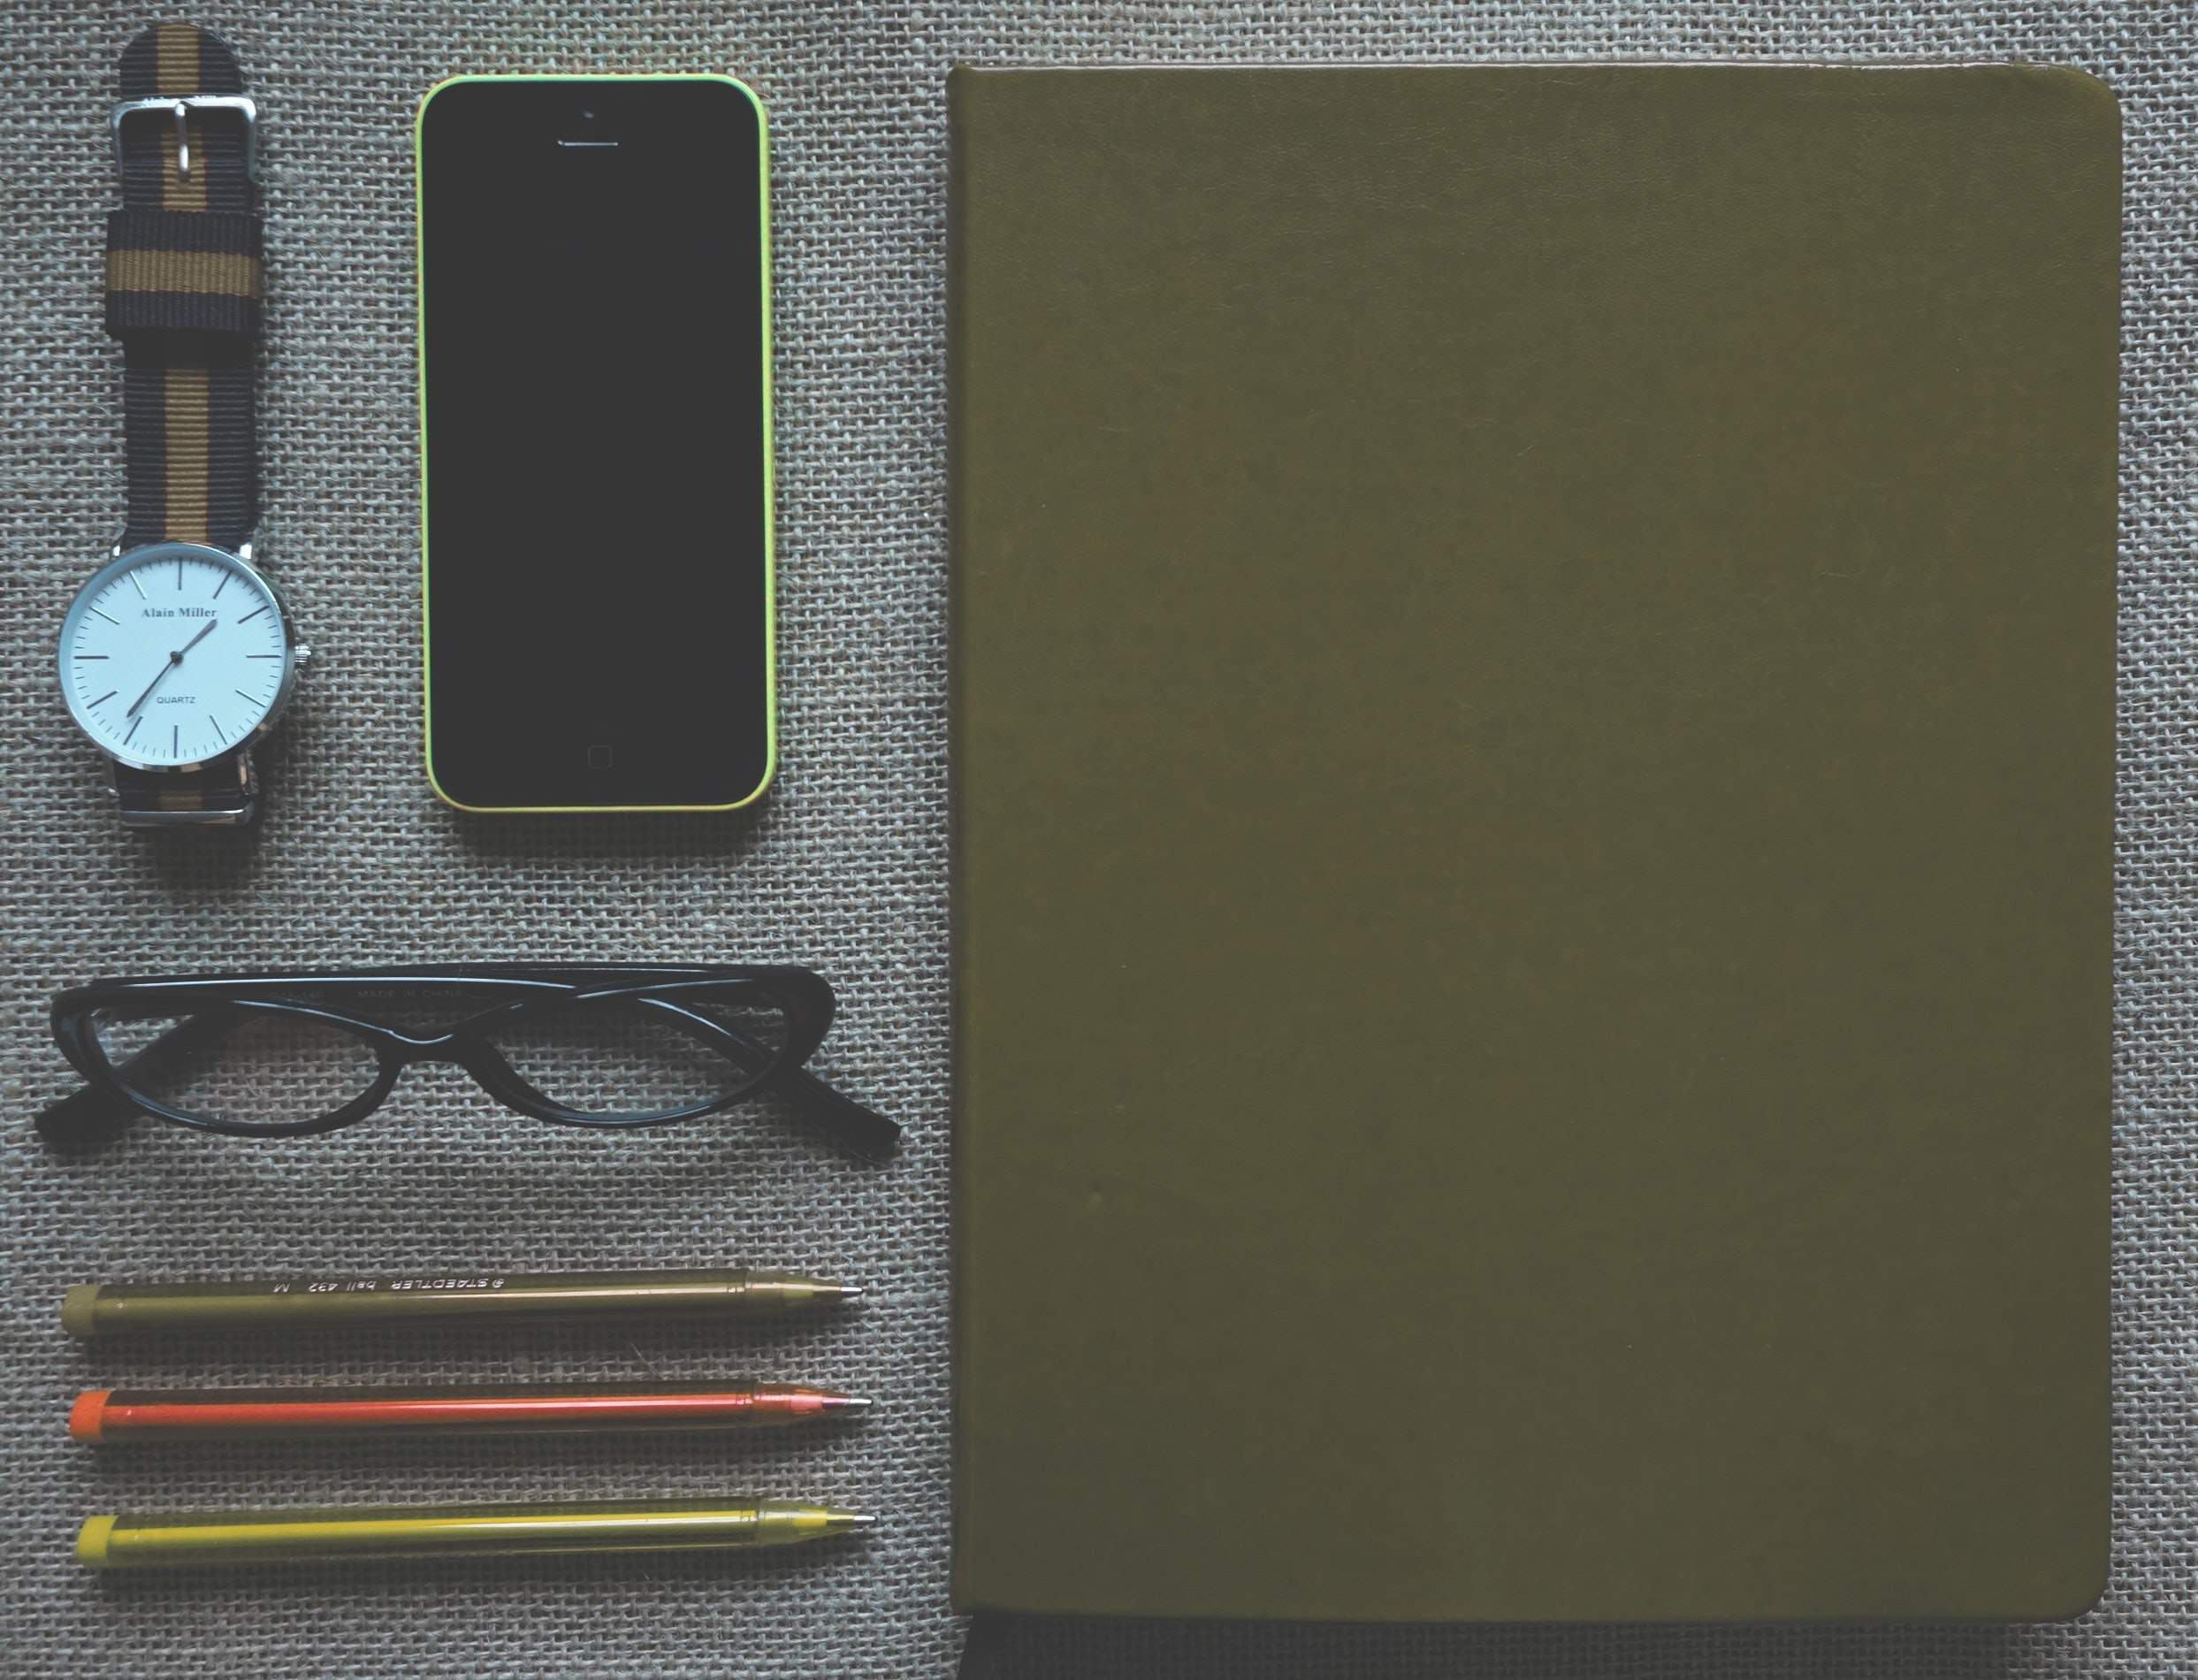 Green Iphone 5c Near Black Frame Eyeglasses, Art, Phone, Wrist watch, Watch, HQ Photo